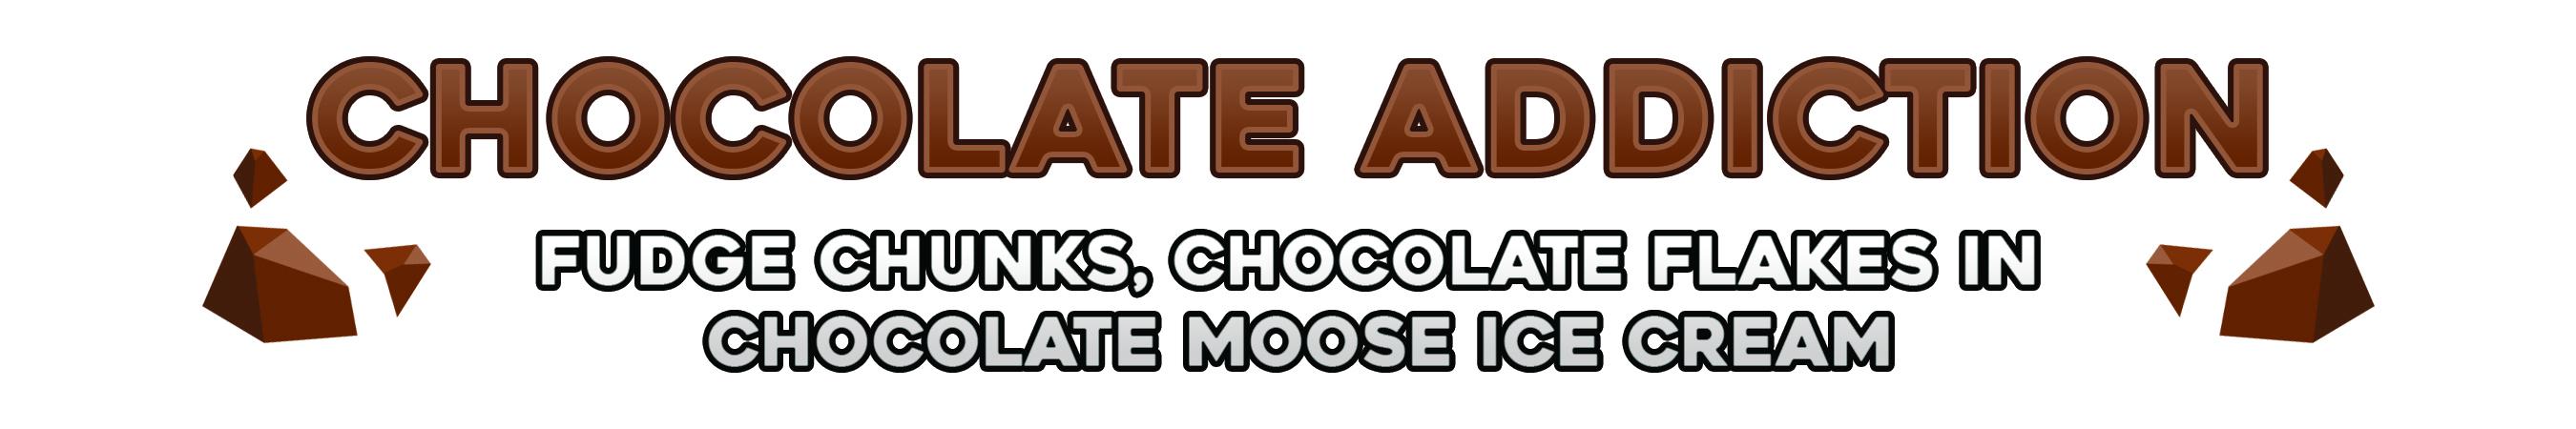 ChocolateAddiction